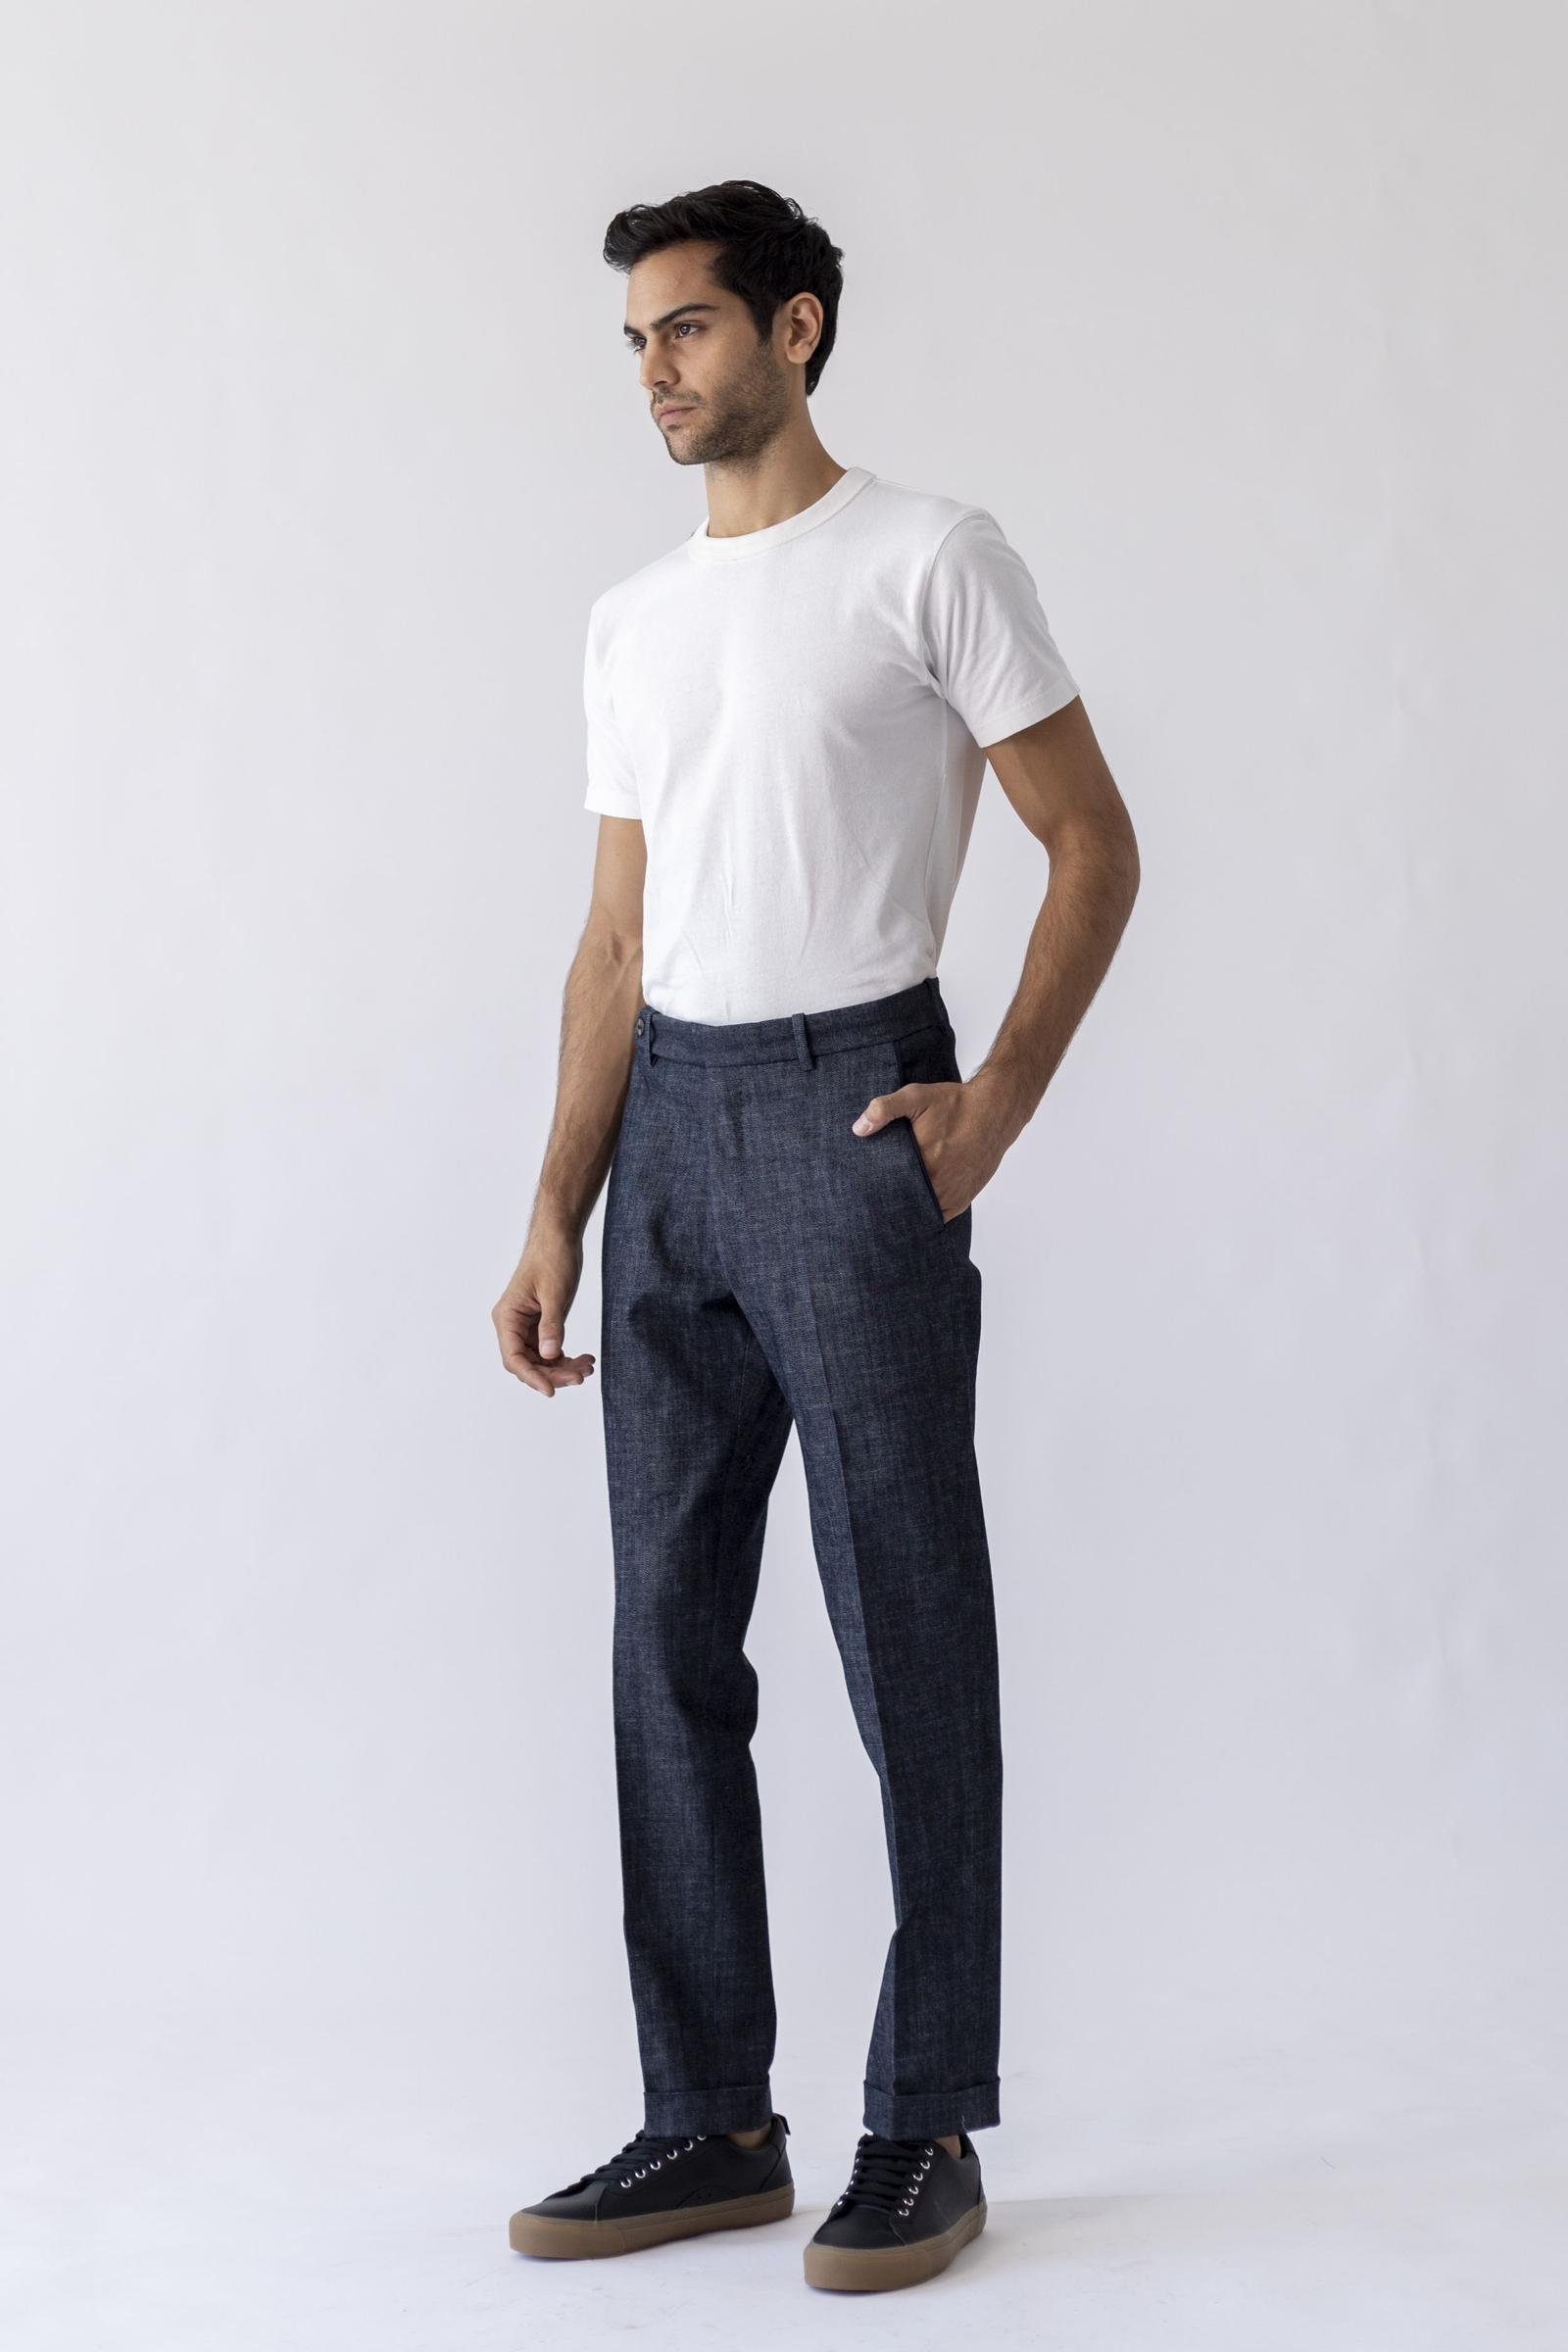 Worko Trouser - Denim Cotton